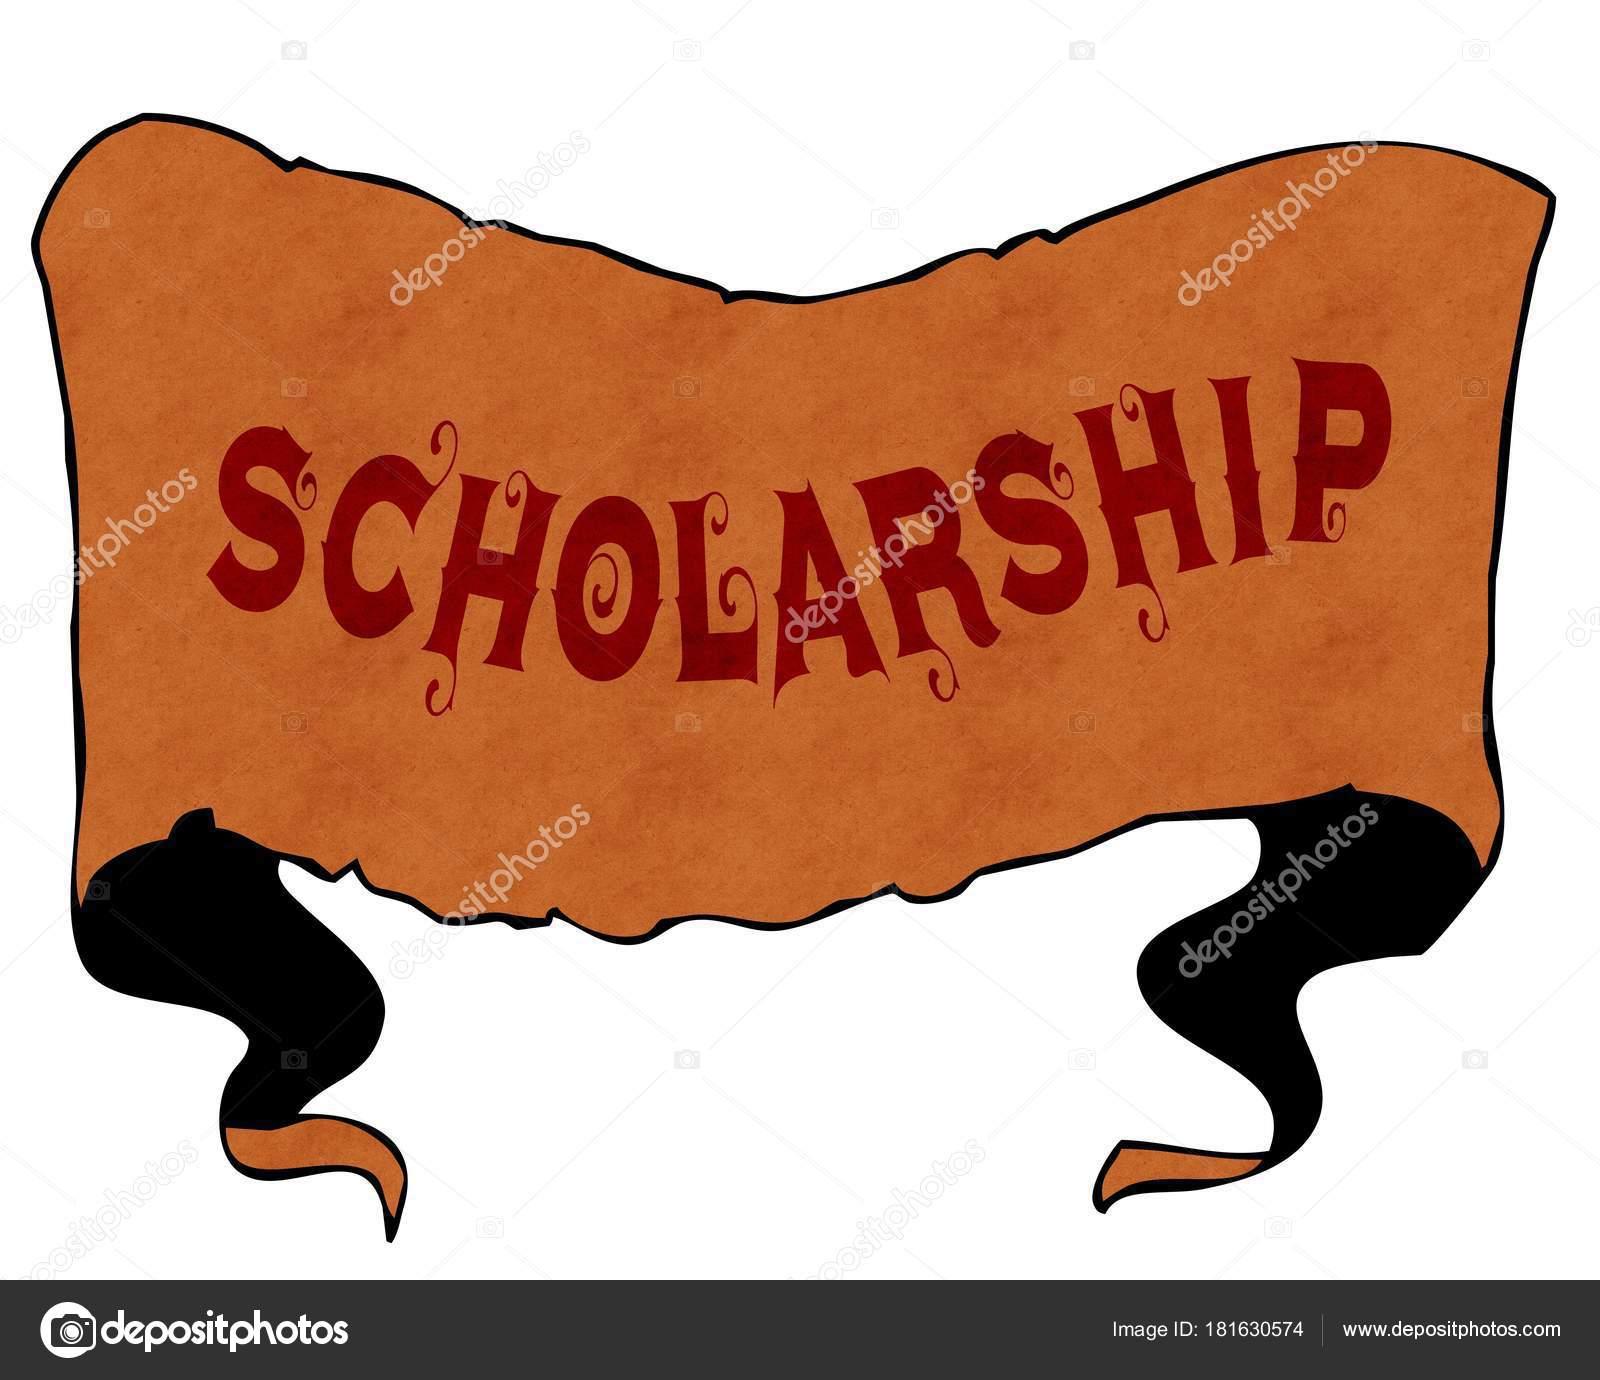 Scholarship Written With Vintage Font On Cartoon Vintage Ribbon Stock Photo C Ionutparvu 181630574